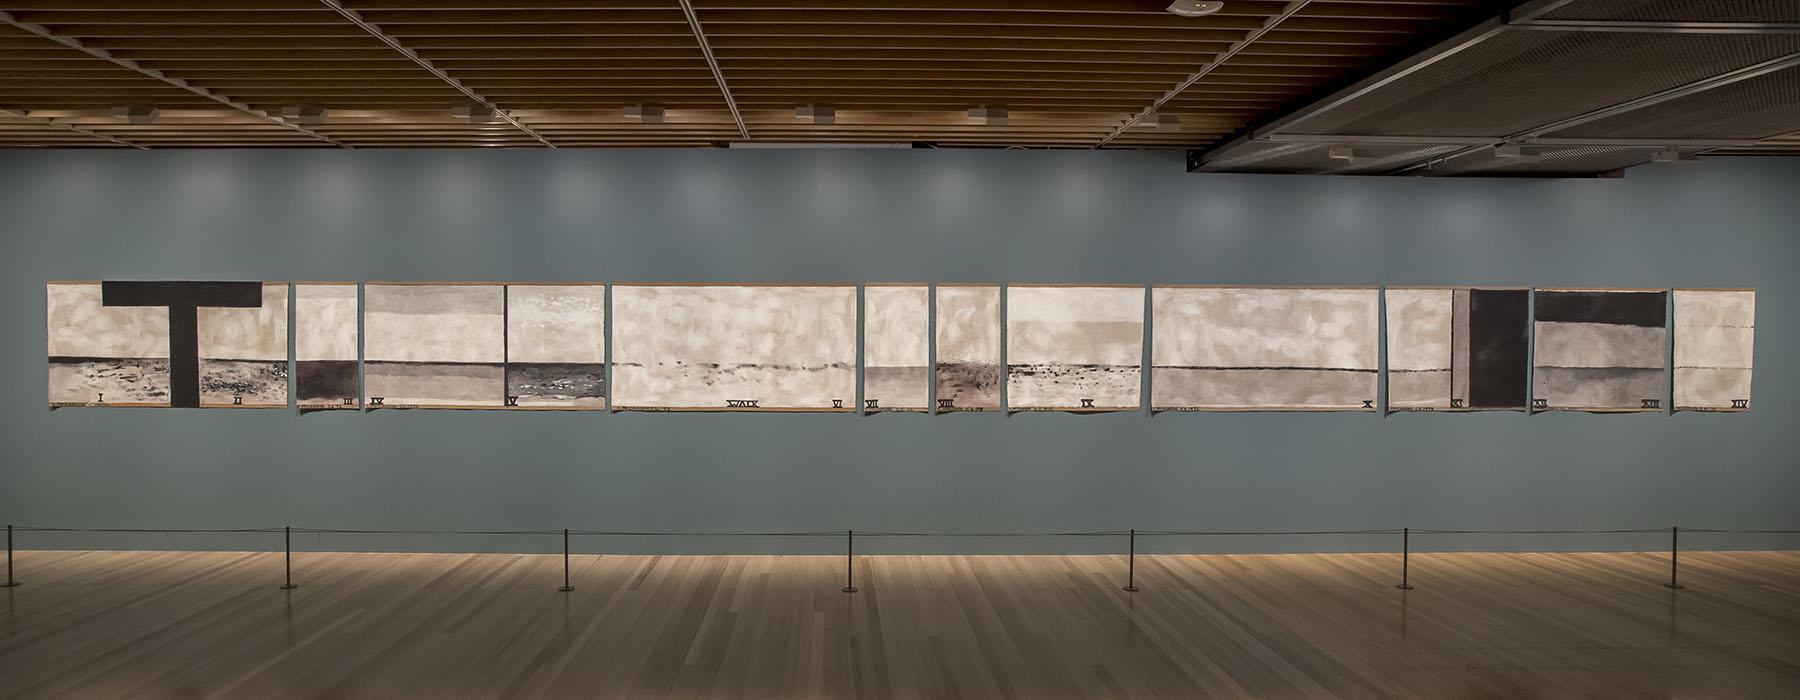 Colin McCahon's Walk (Series C) hangs on a wall in Toi Art